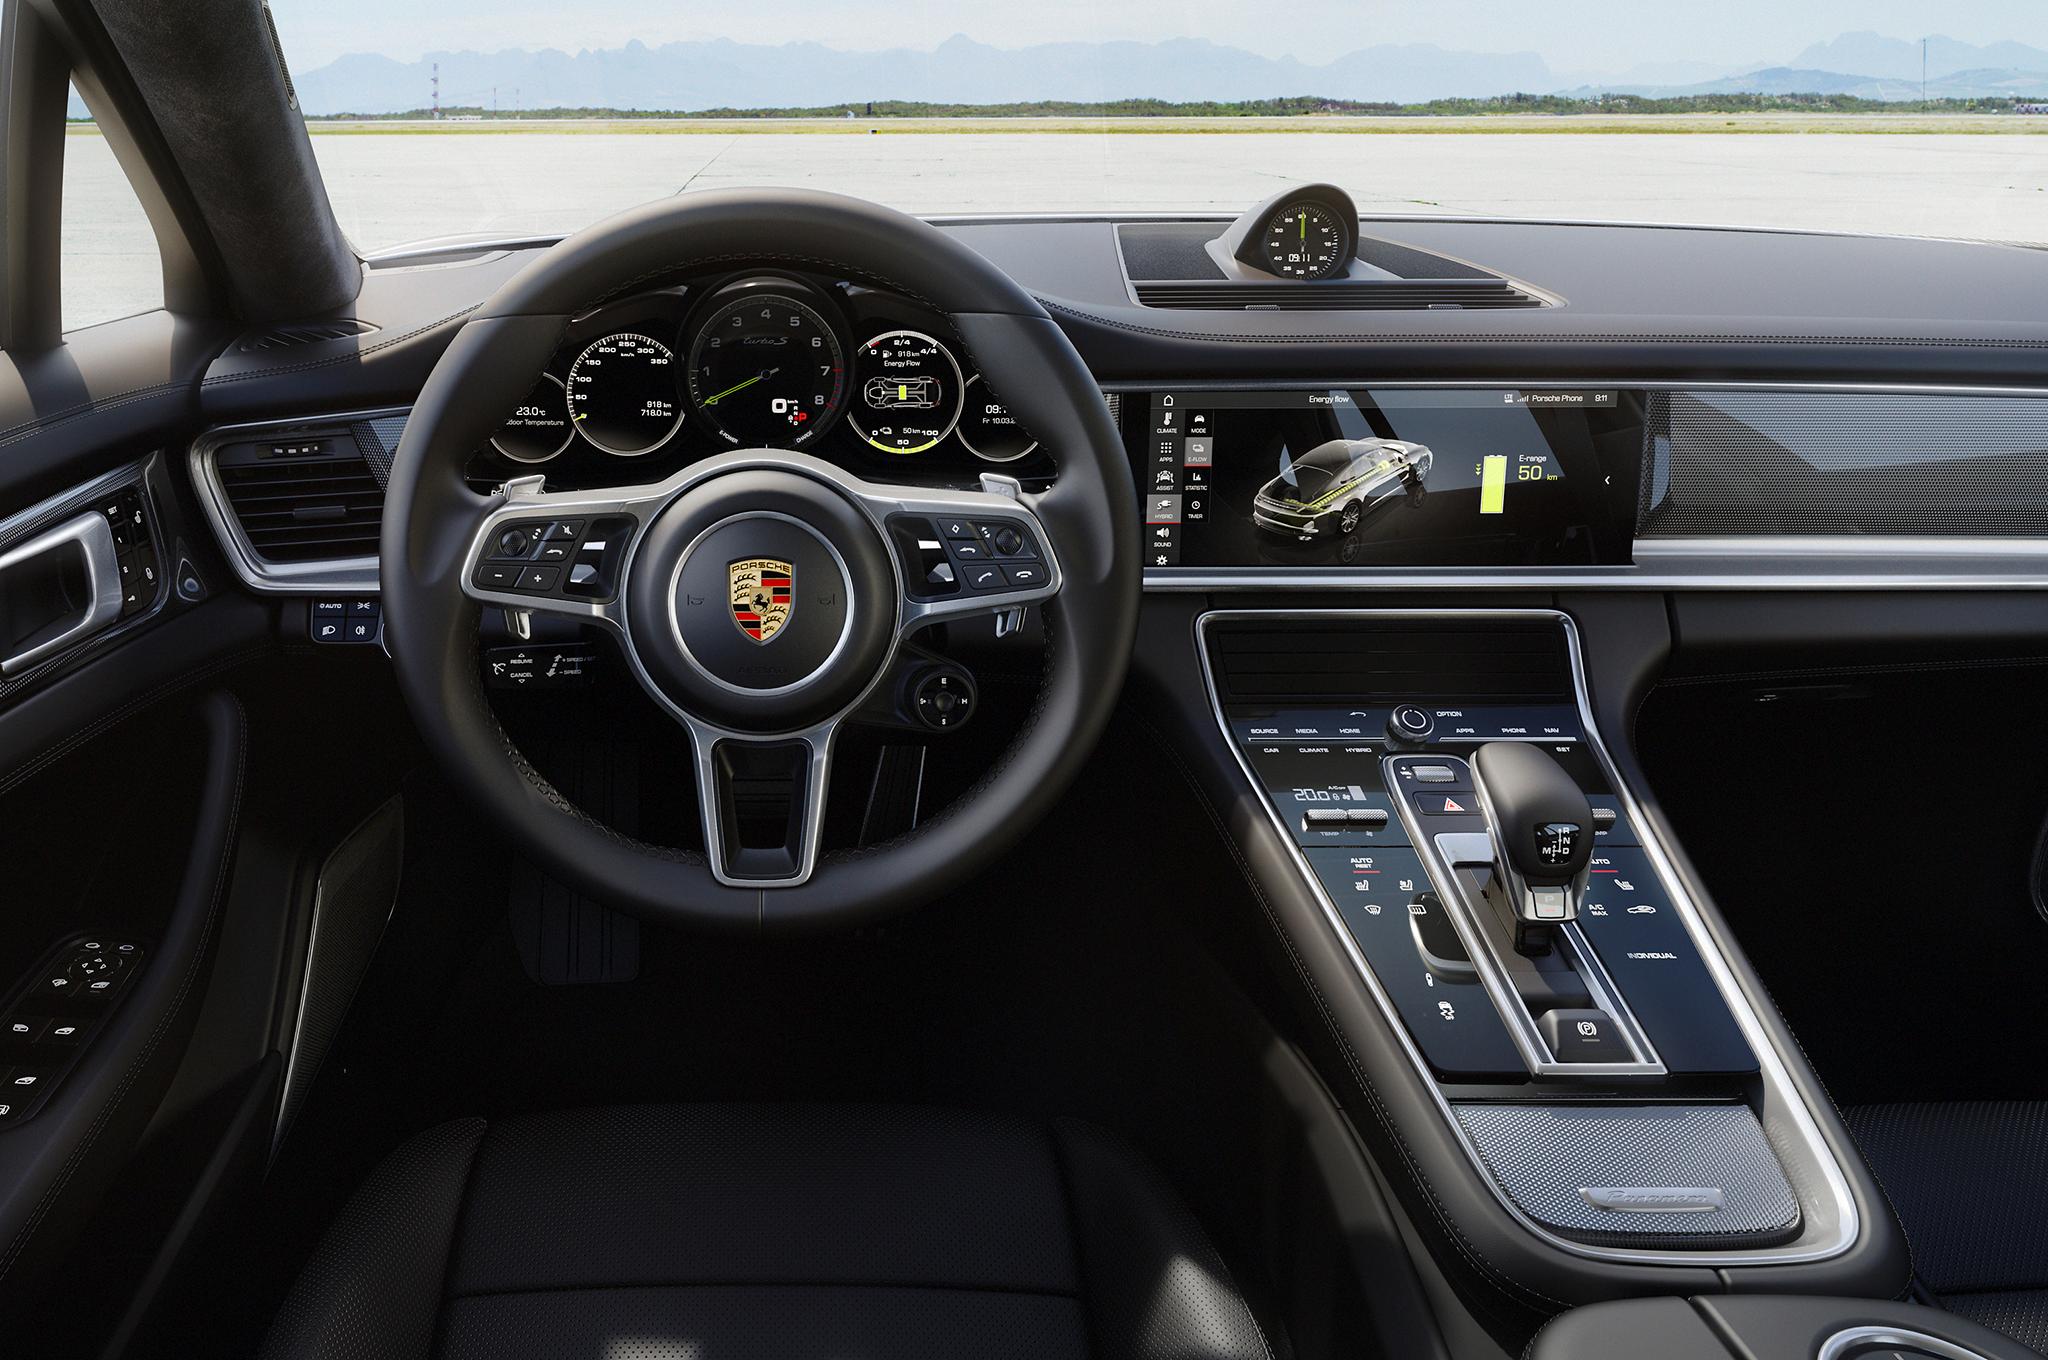 2018 Porsche Panamera Turbo S E Hybrid Interior